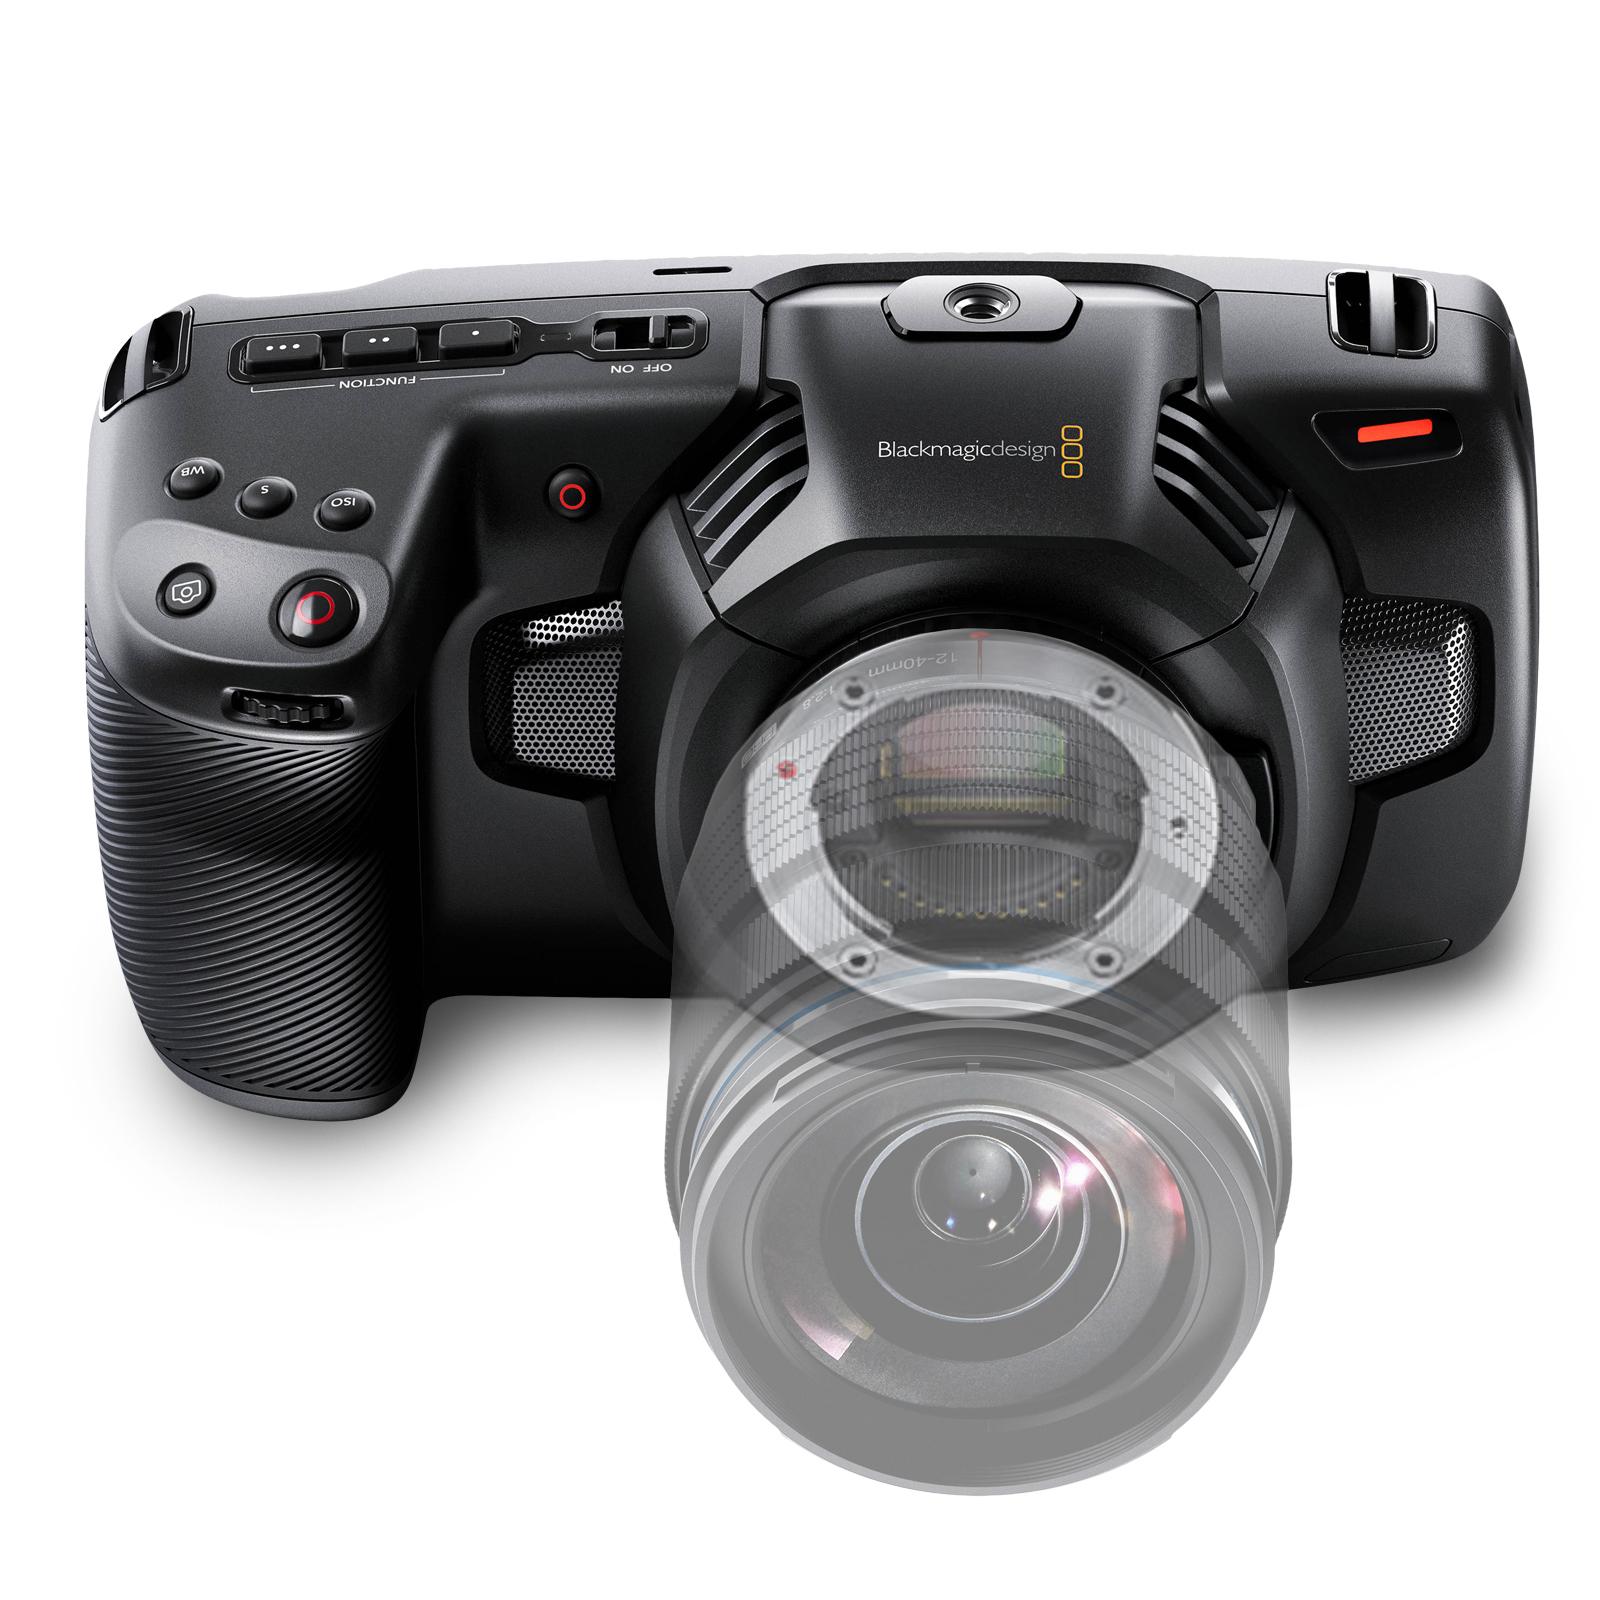 Blackmagic Pocket Cinema Camera 4K available for rent at Digital Azul